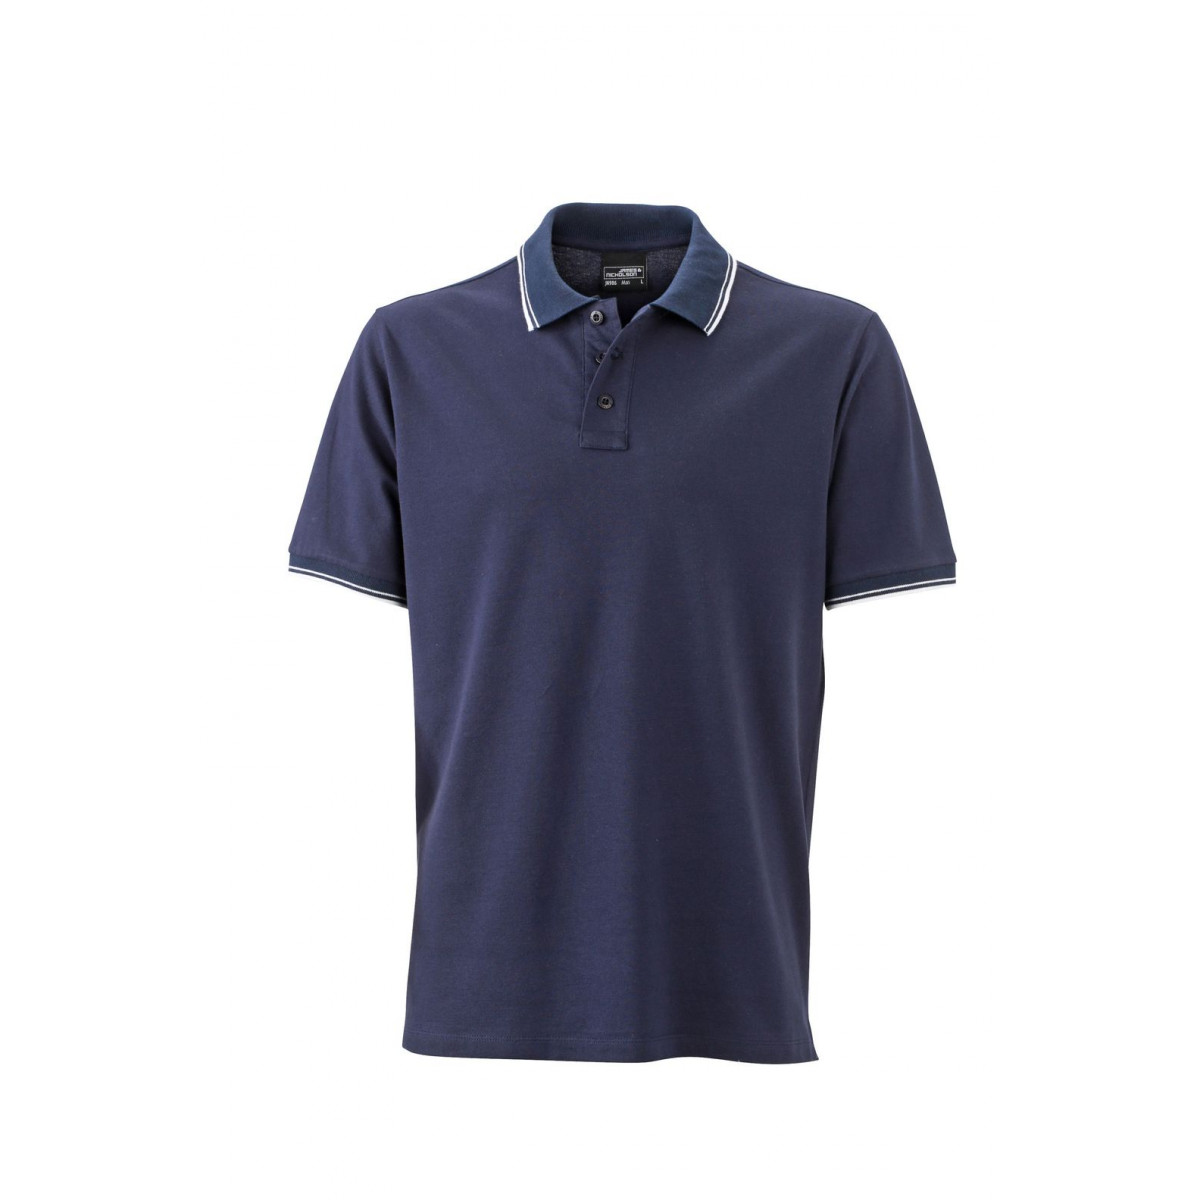 Рубашка поло мужская JN986 Mens Polo - Темно-синий/Белый